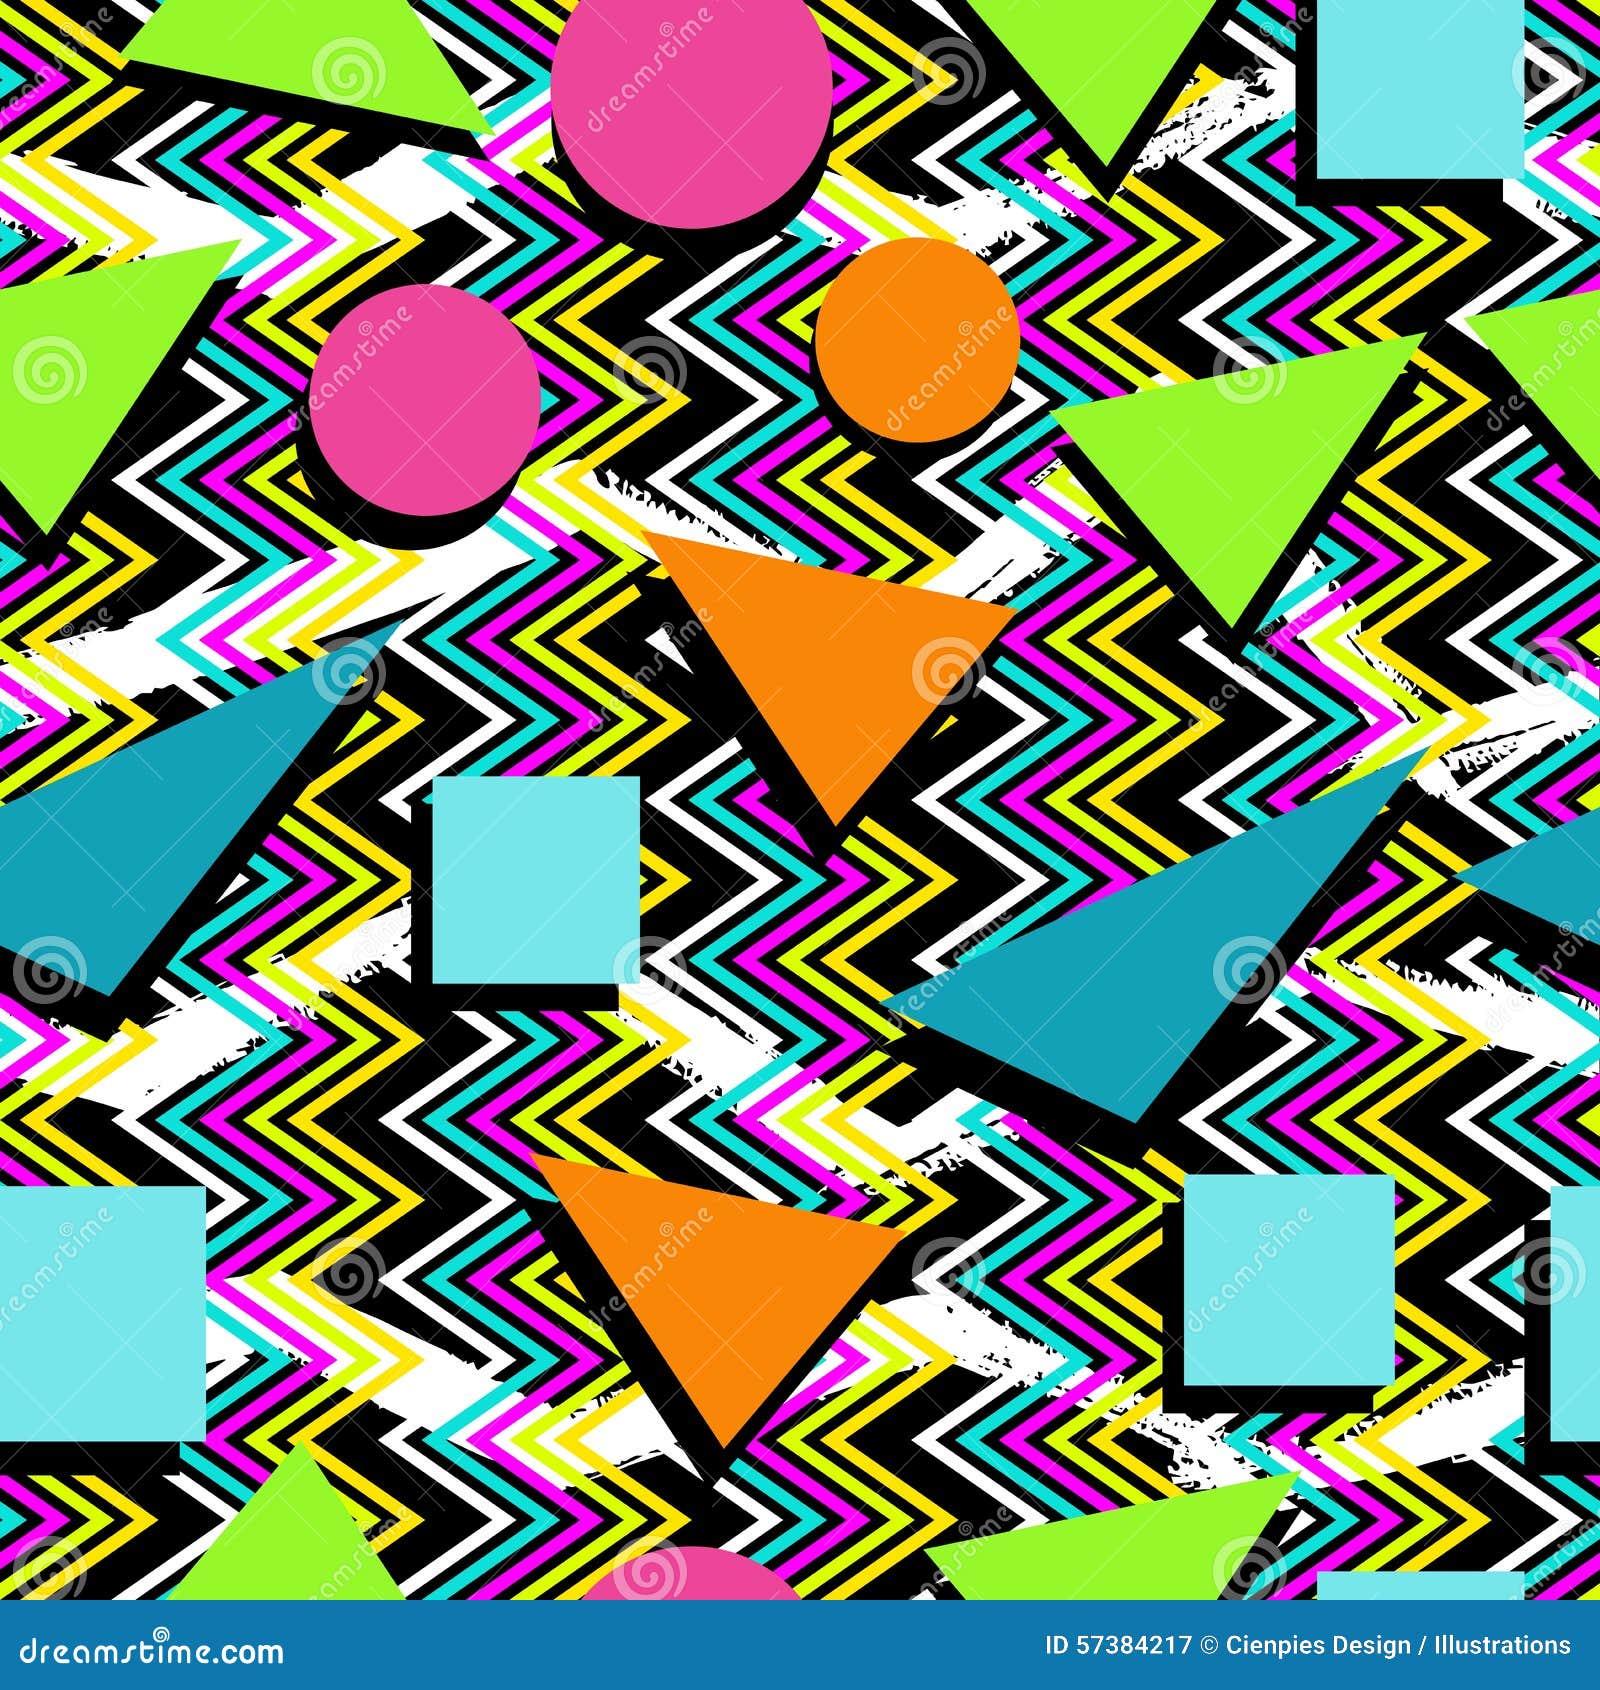 80s Pattern Cool Design Inspiration